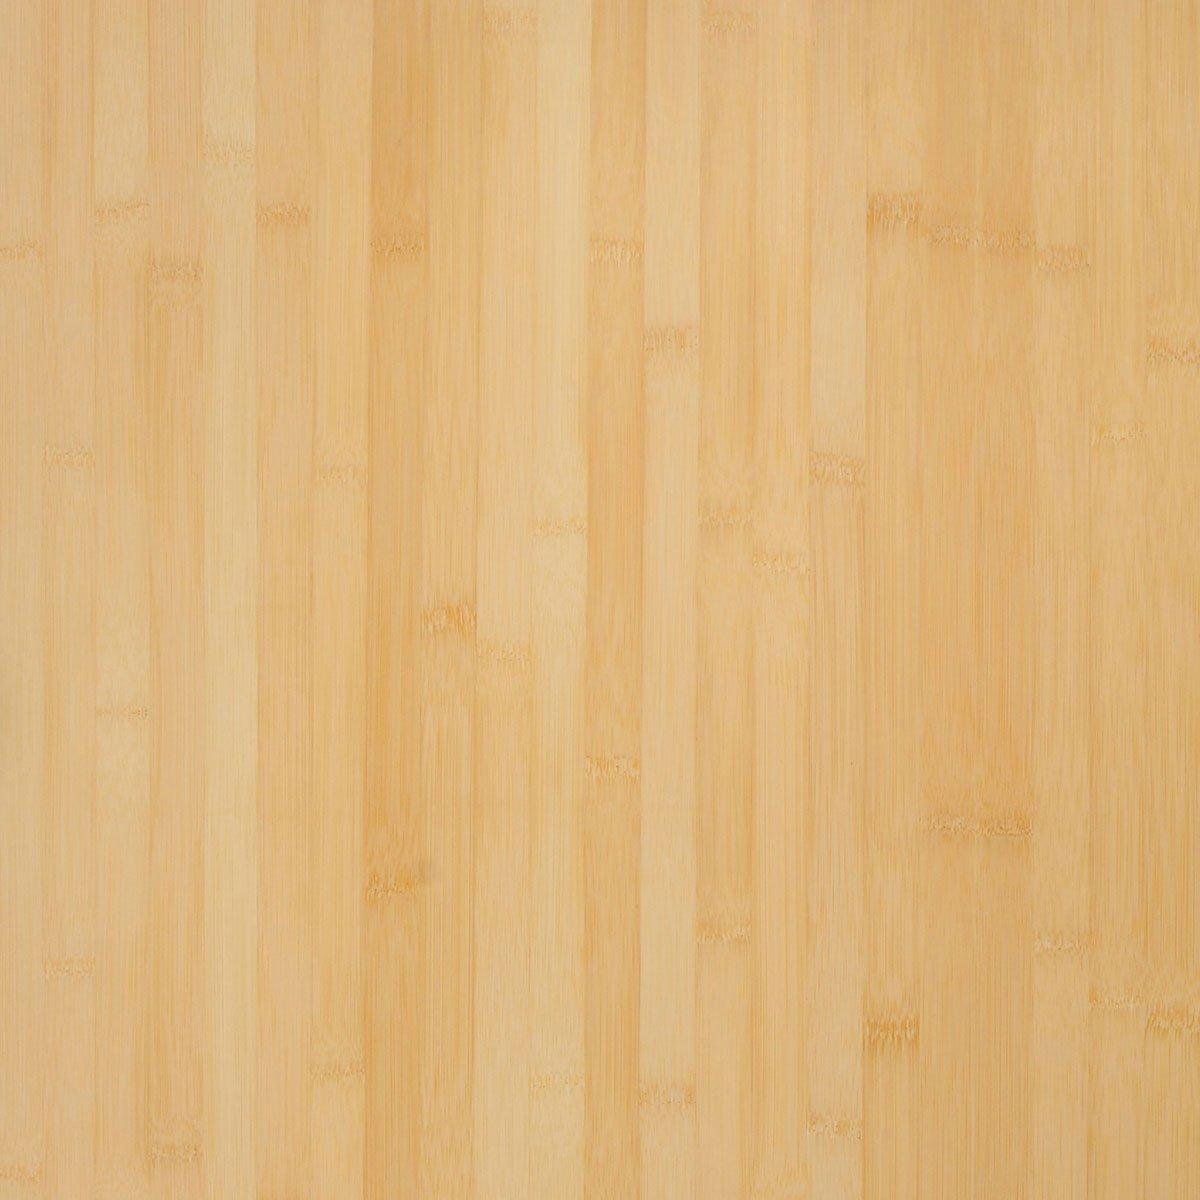 WORKTOPEXPRESS Solid Bamboo Timber Block Worktops 2000mm x 620mm x 40mm WORKTOP EXPRESS